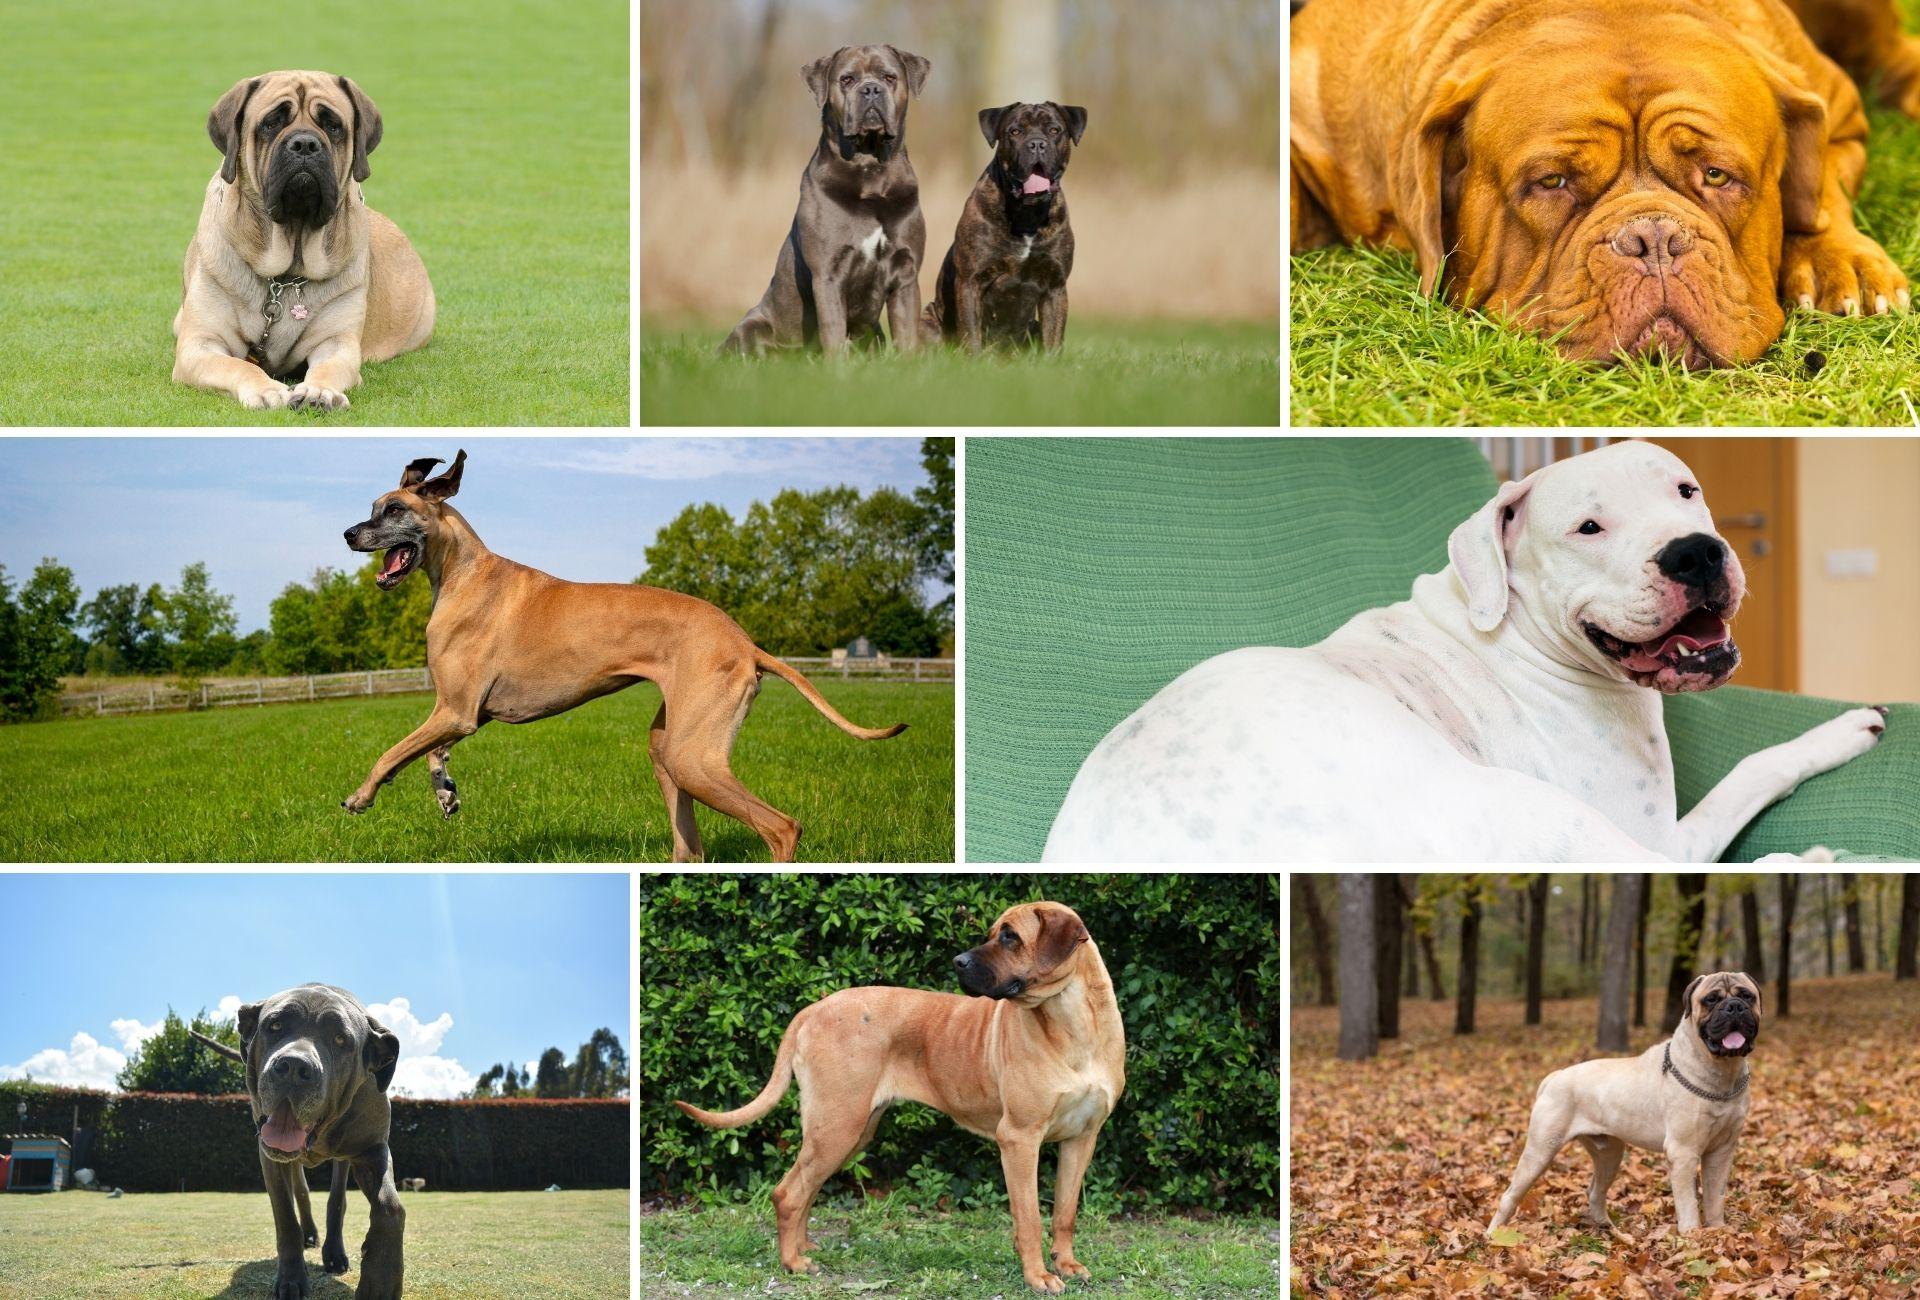 Collection of eight Mastiffs breeds including the English Mastiff, Cane Corso, Dogue de Bordeaux, Great Dane, Dogo Argentino, Neapolita Mastiff, Tosa Inu, and Boerboel.